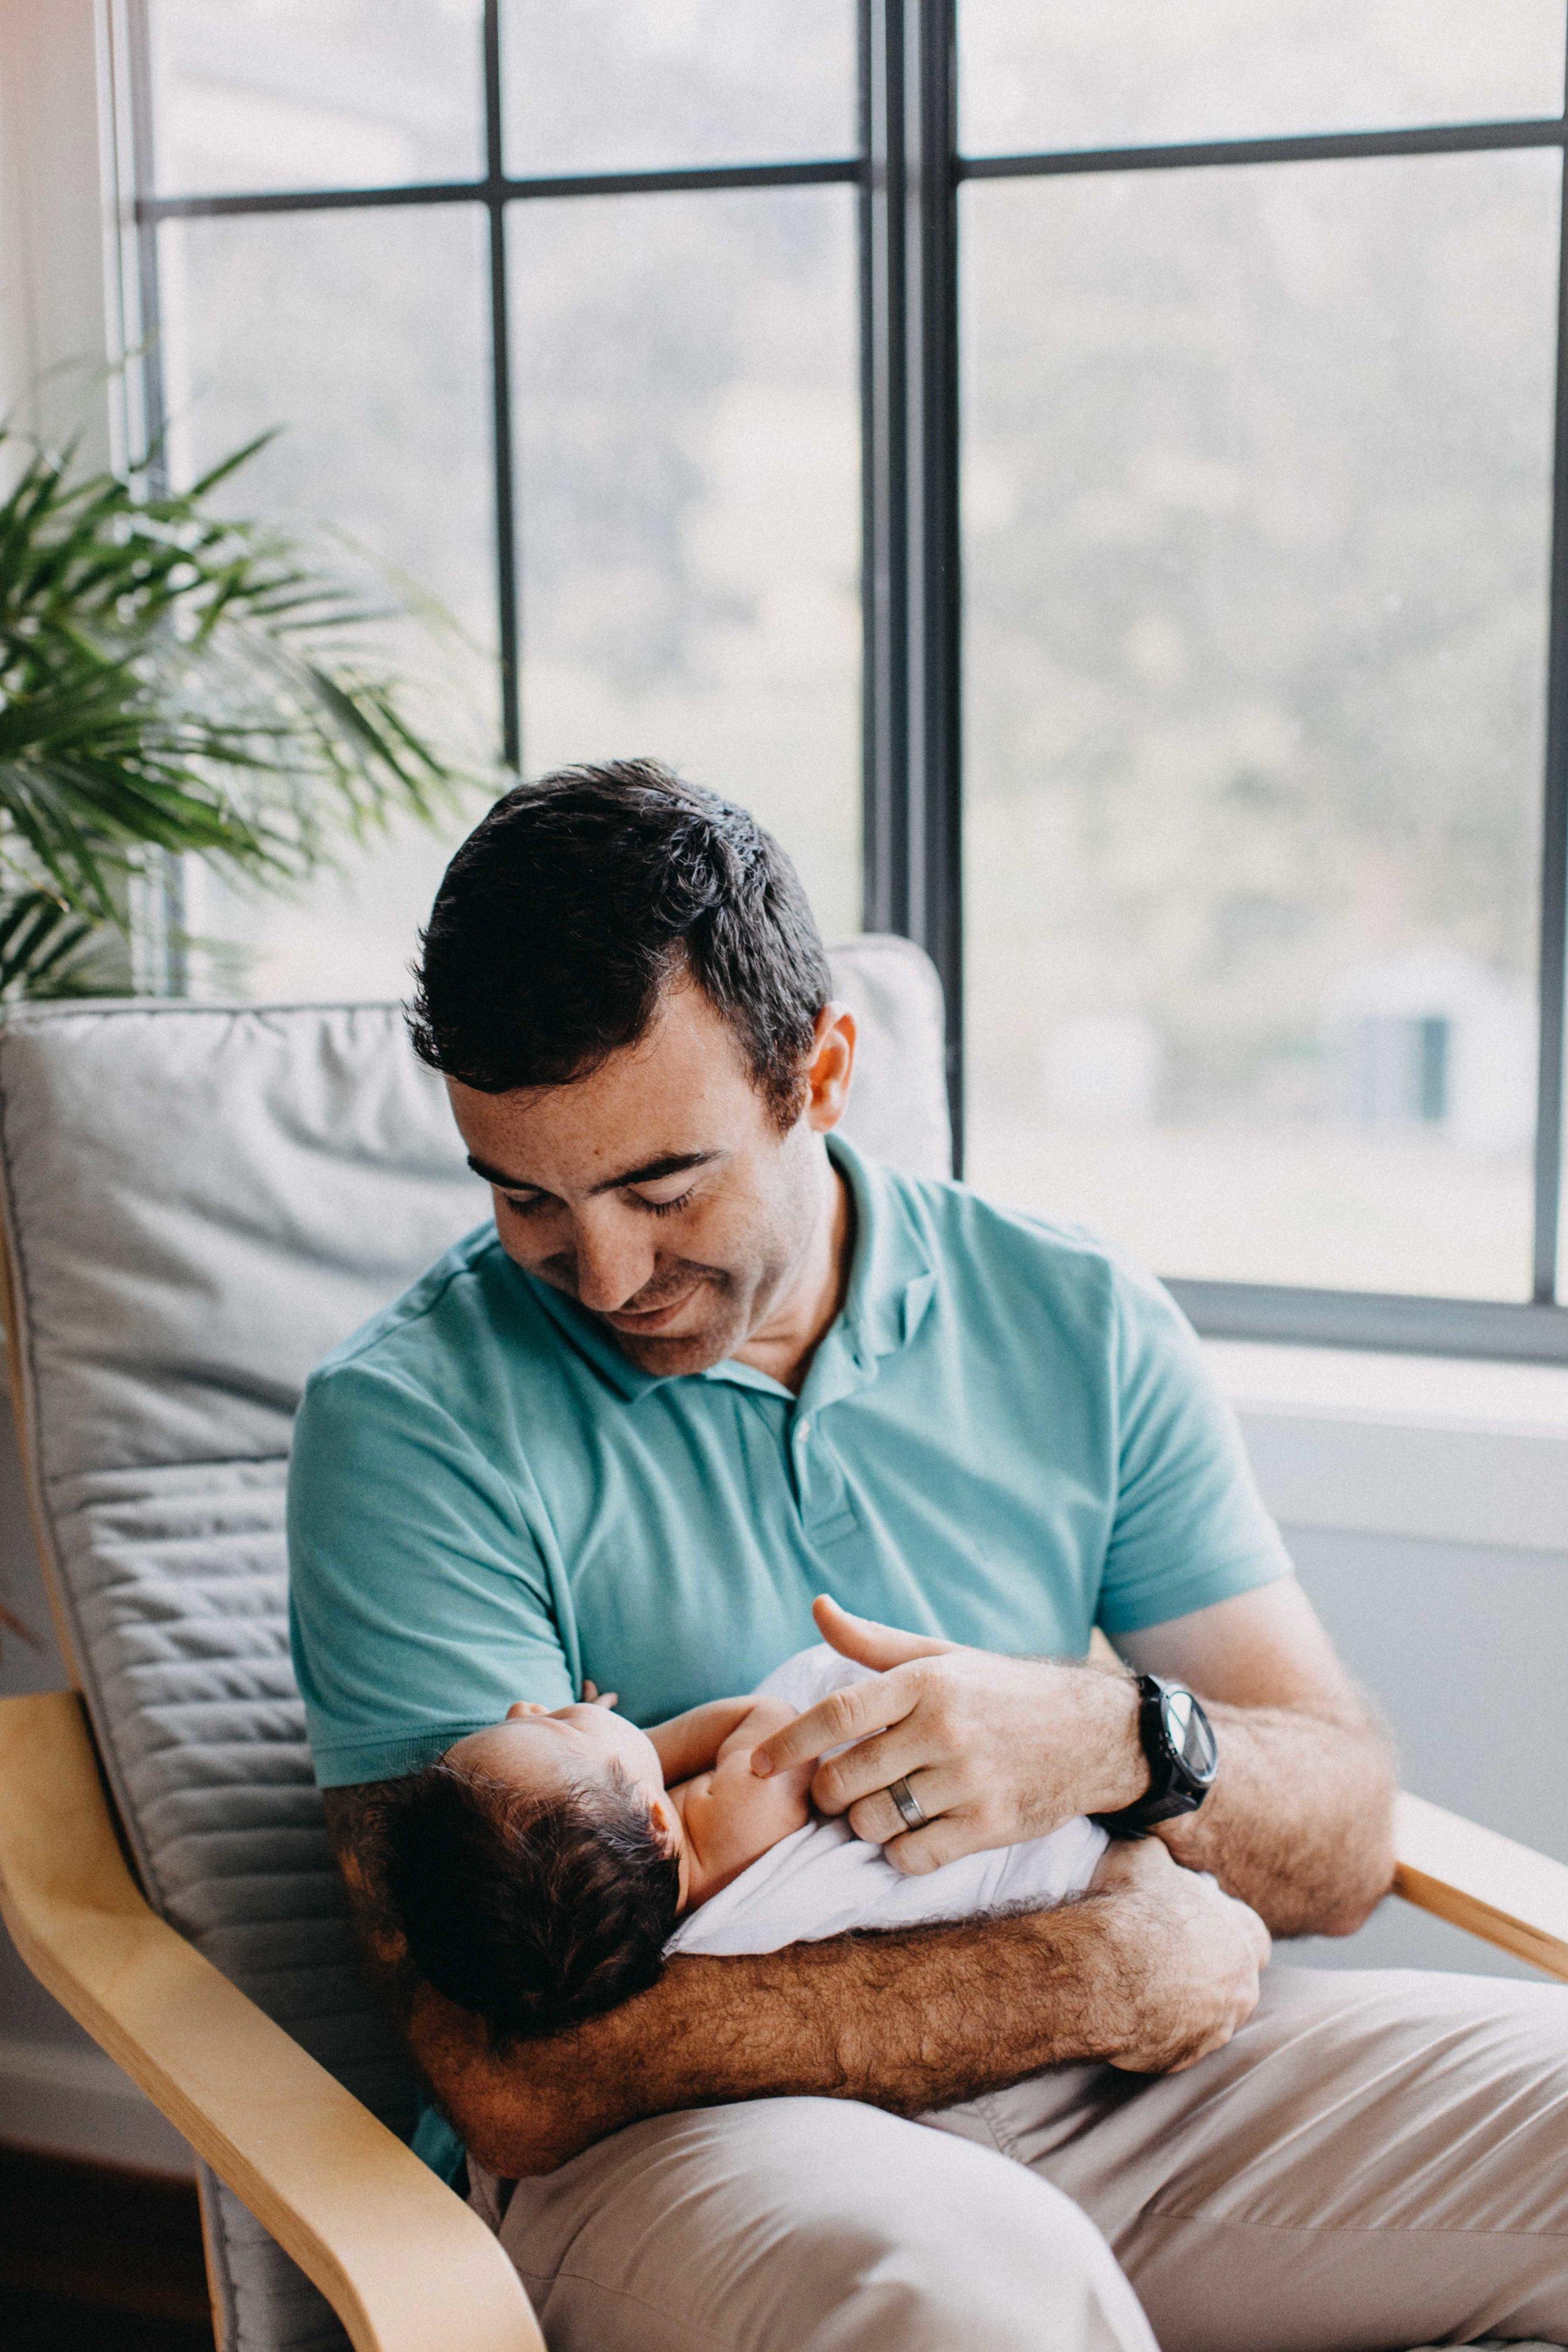 camden-newborn-photographer-laura-www.emilyobrienphotography.net-35.jpg